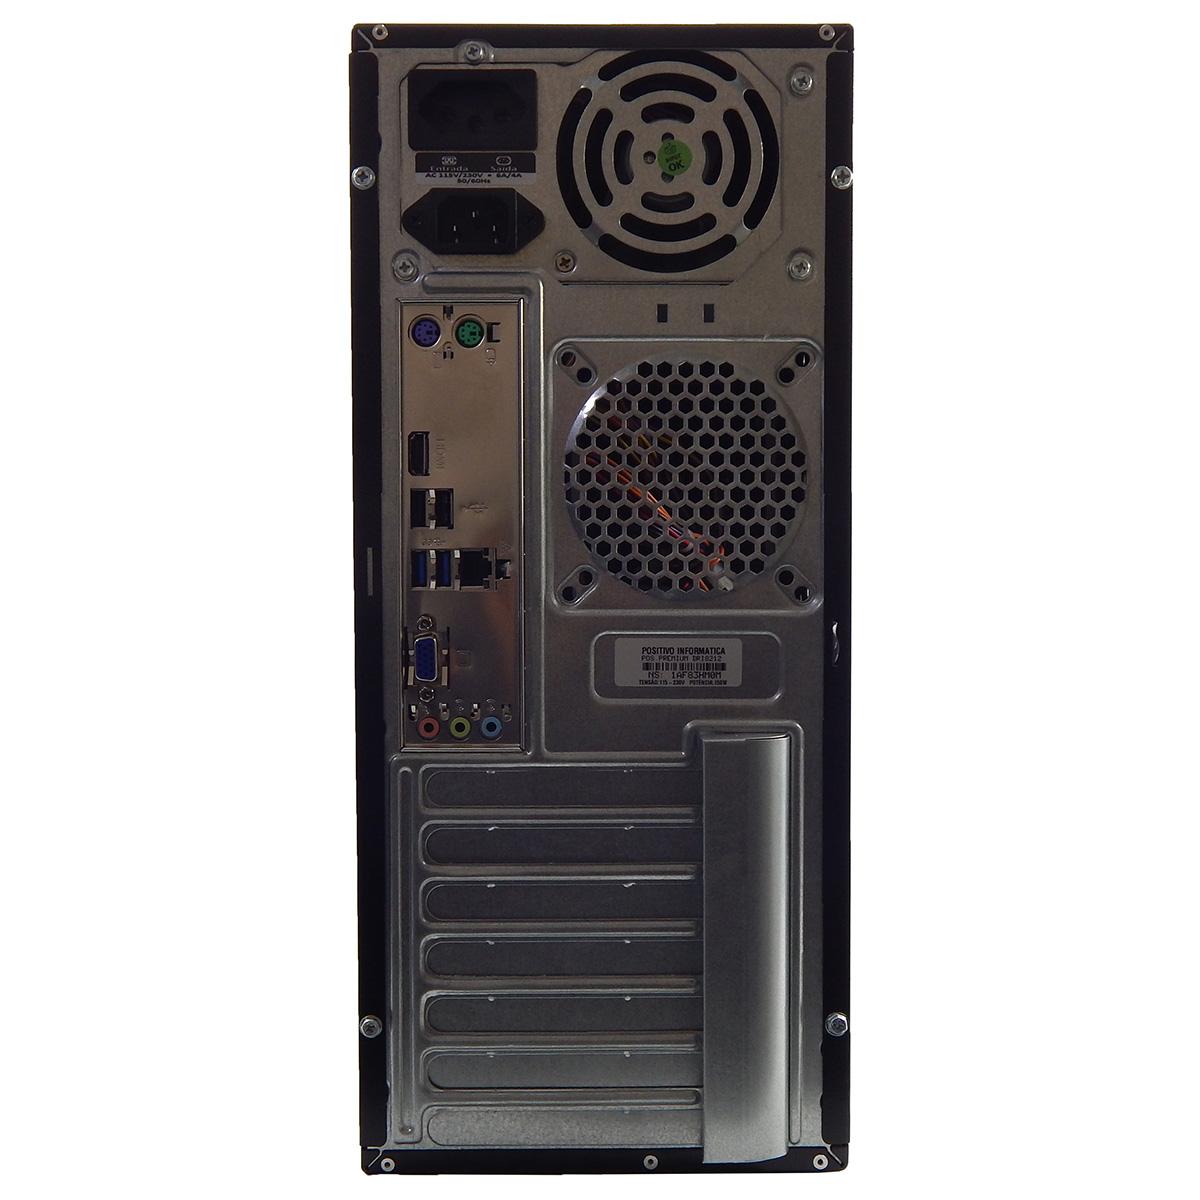 PC POSITIVO PREMIUM DRI8432 I5-4460 4Gb 1Tb Gravador DVD - Reembalado